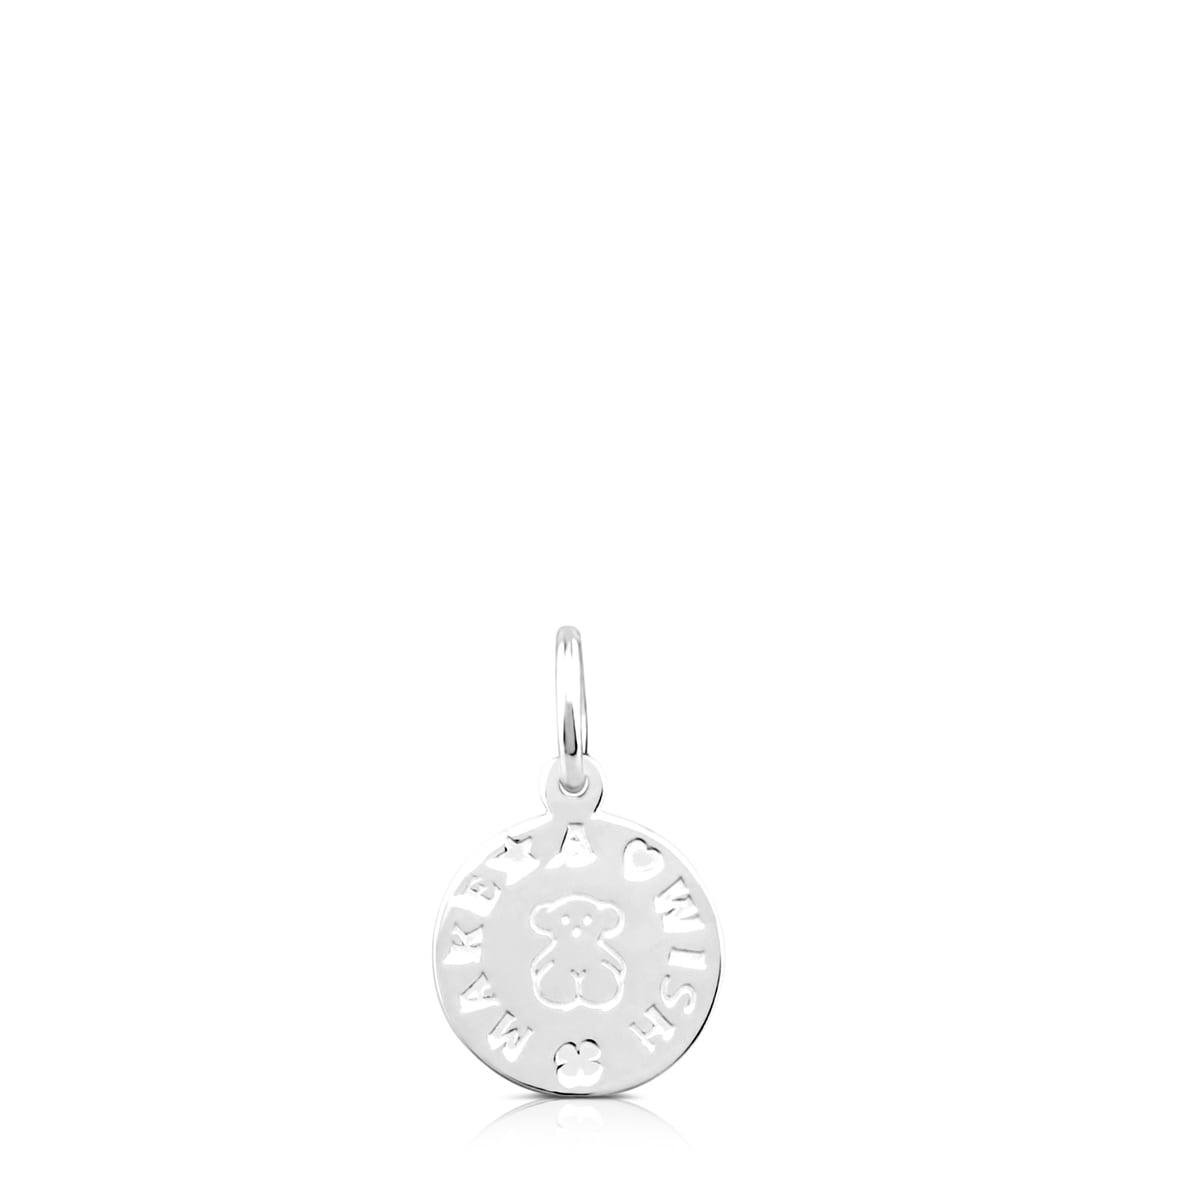 Colgante Toussi medalla oso de plata